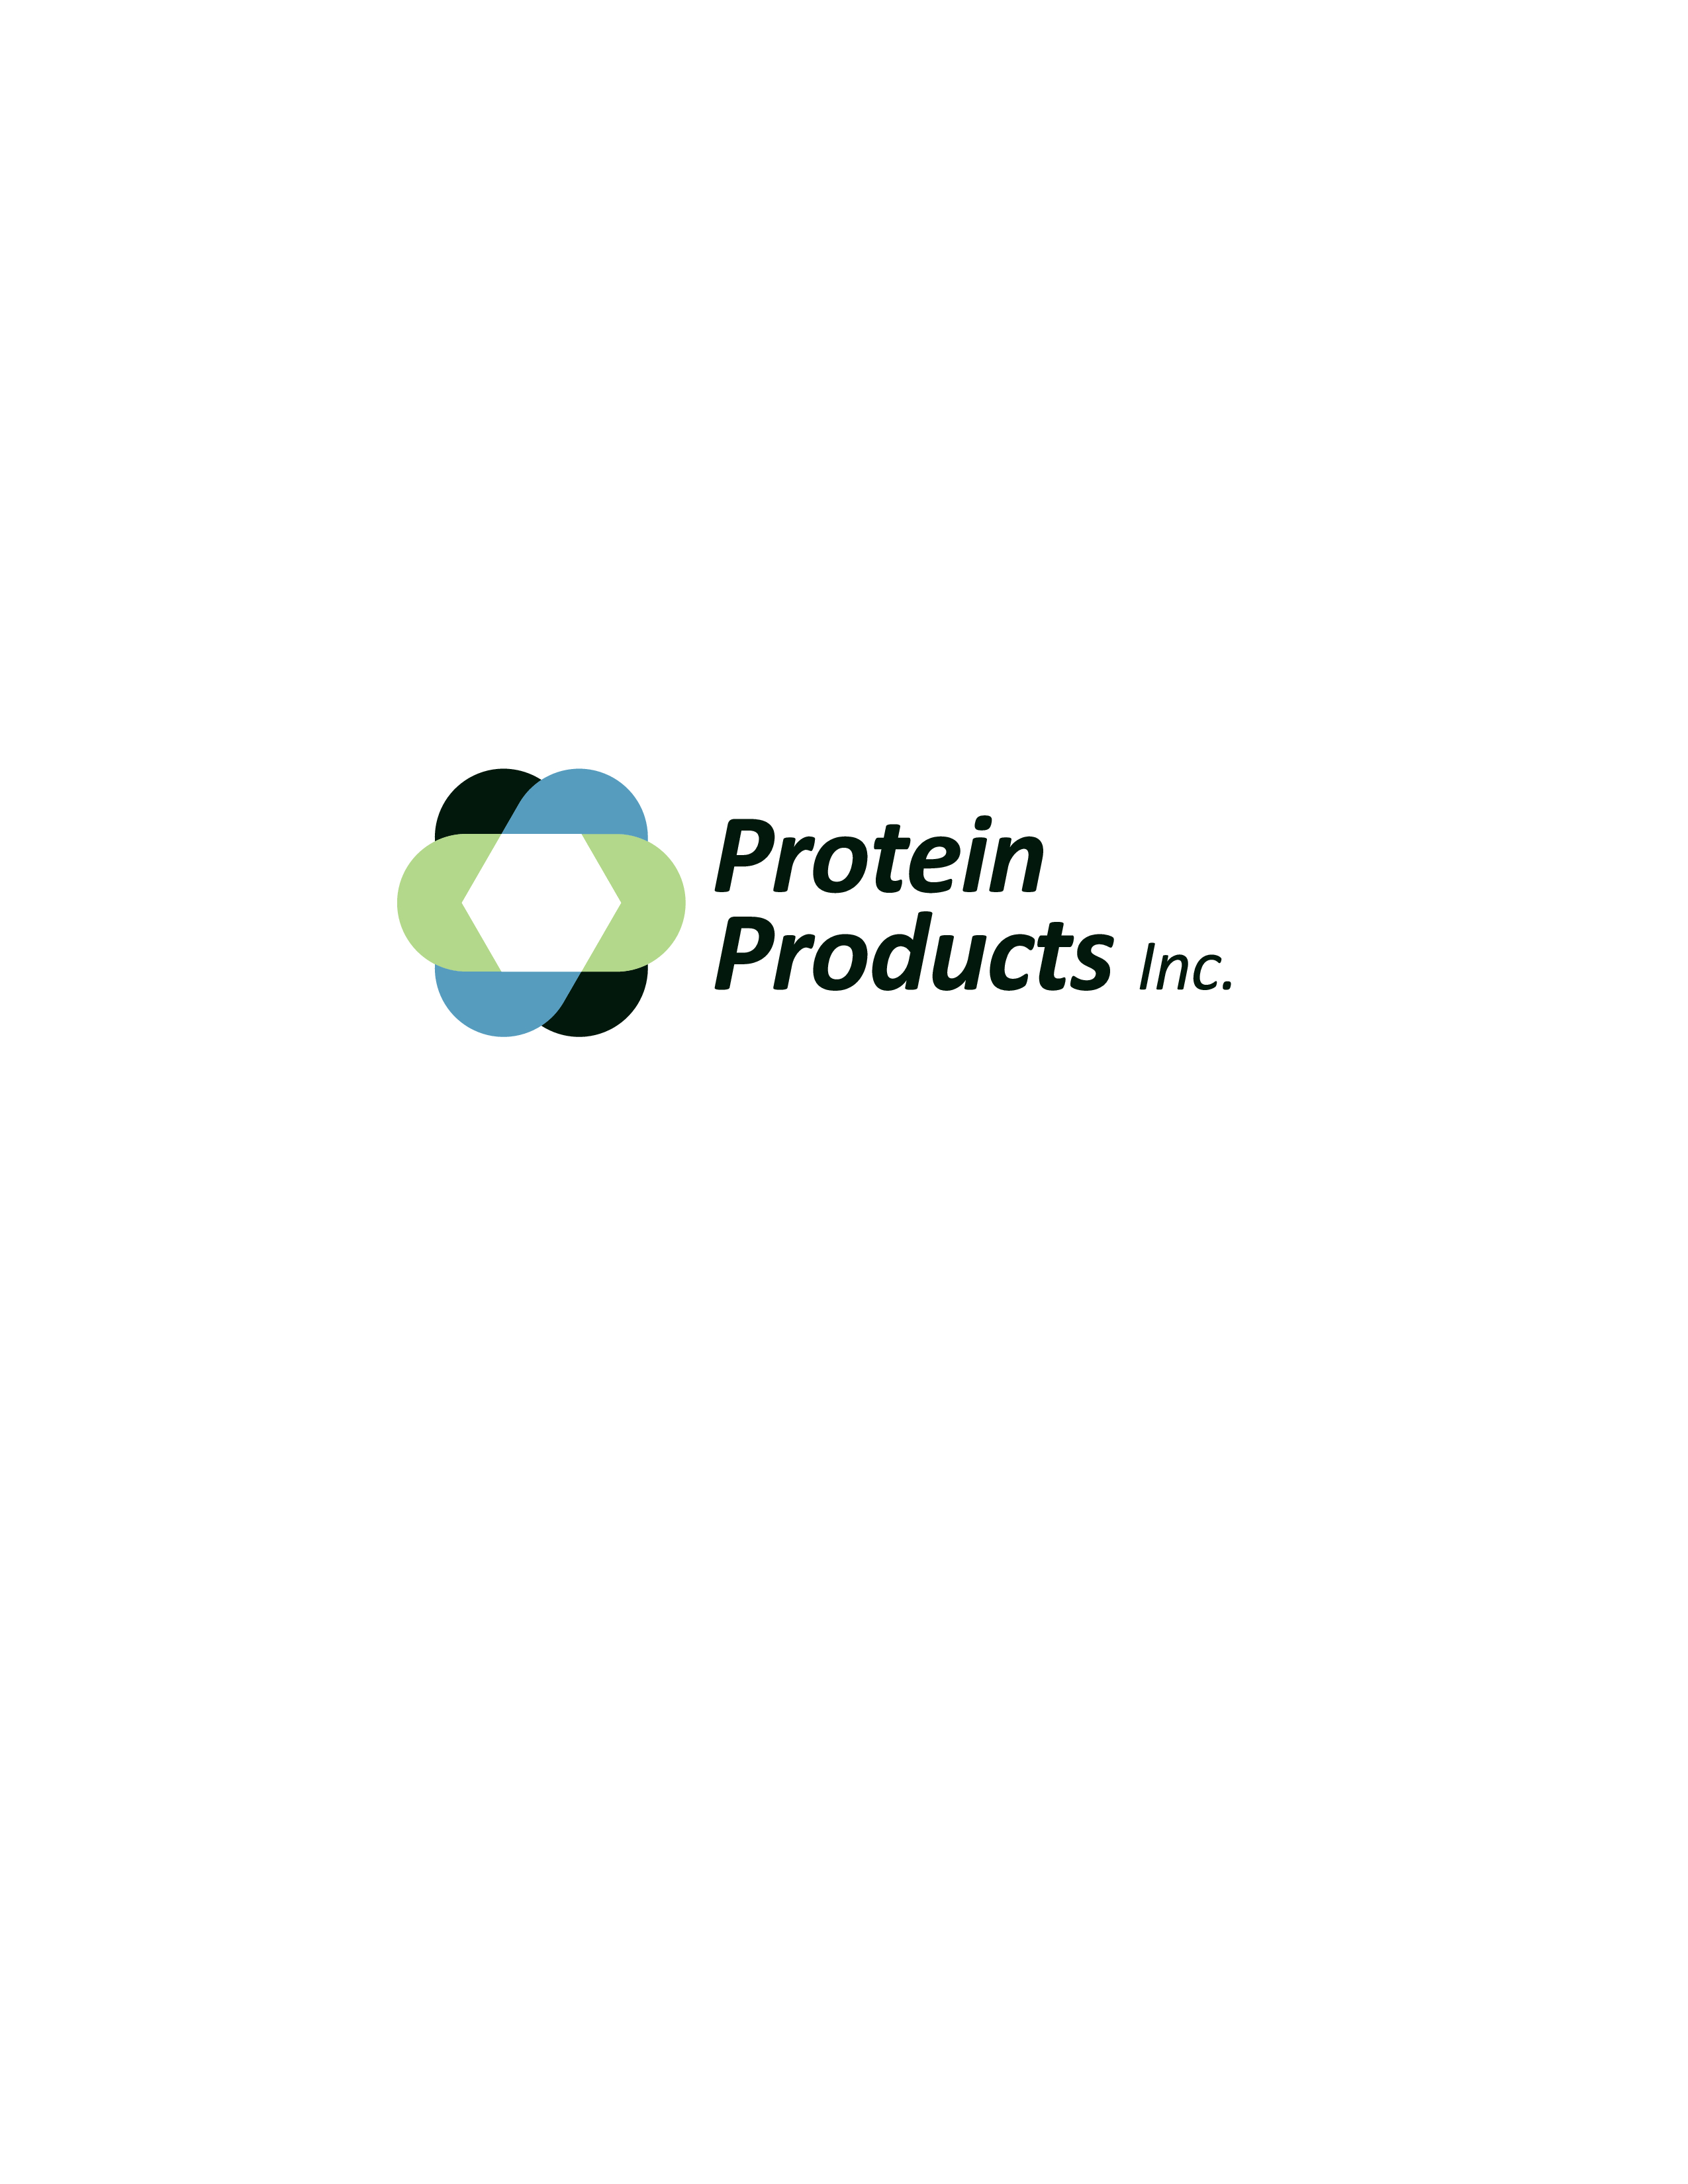 """Six Squad"" - Hole Sponsor - Protein Products, Inc. - Logo"